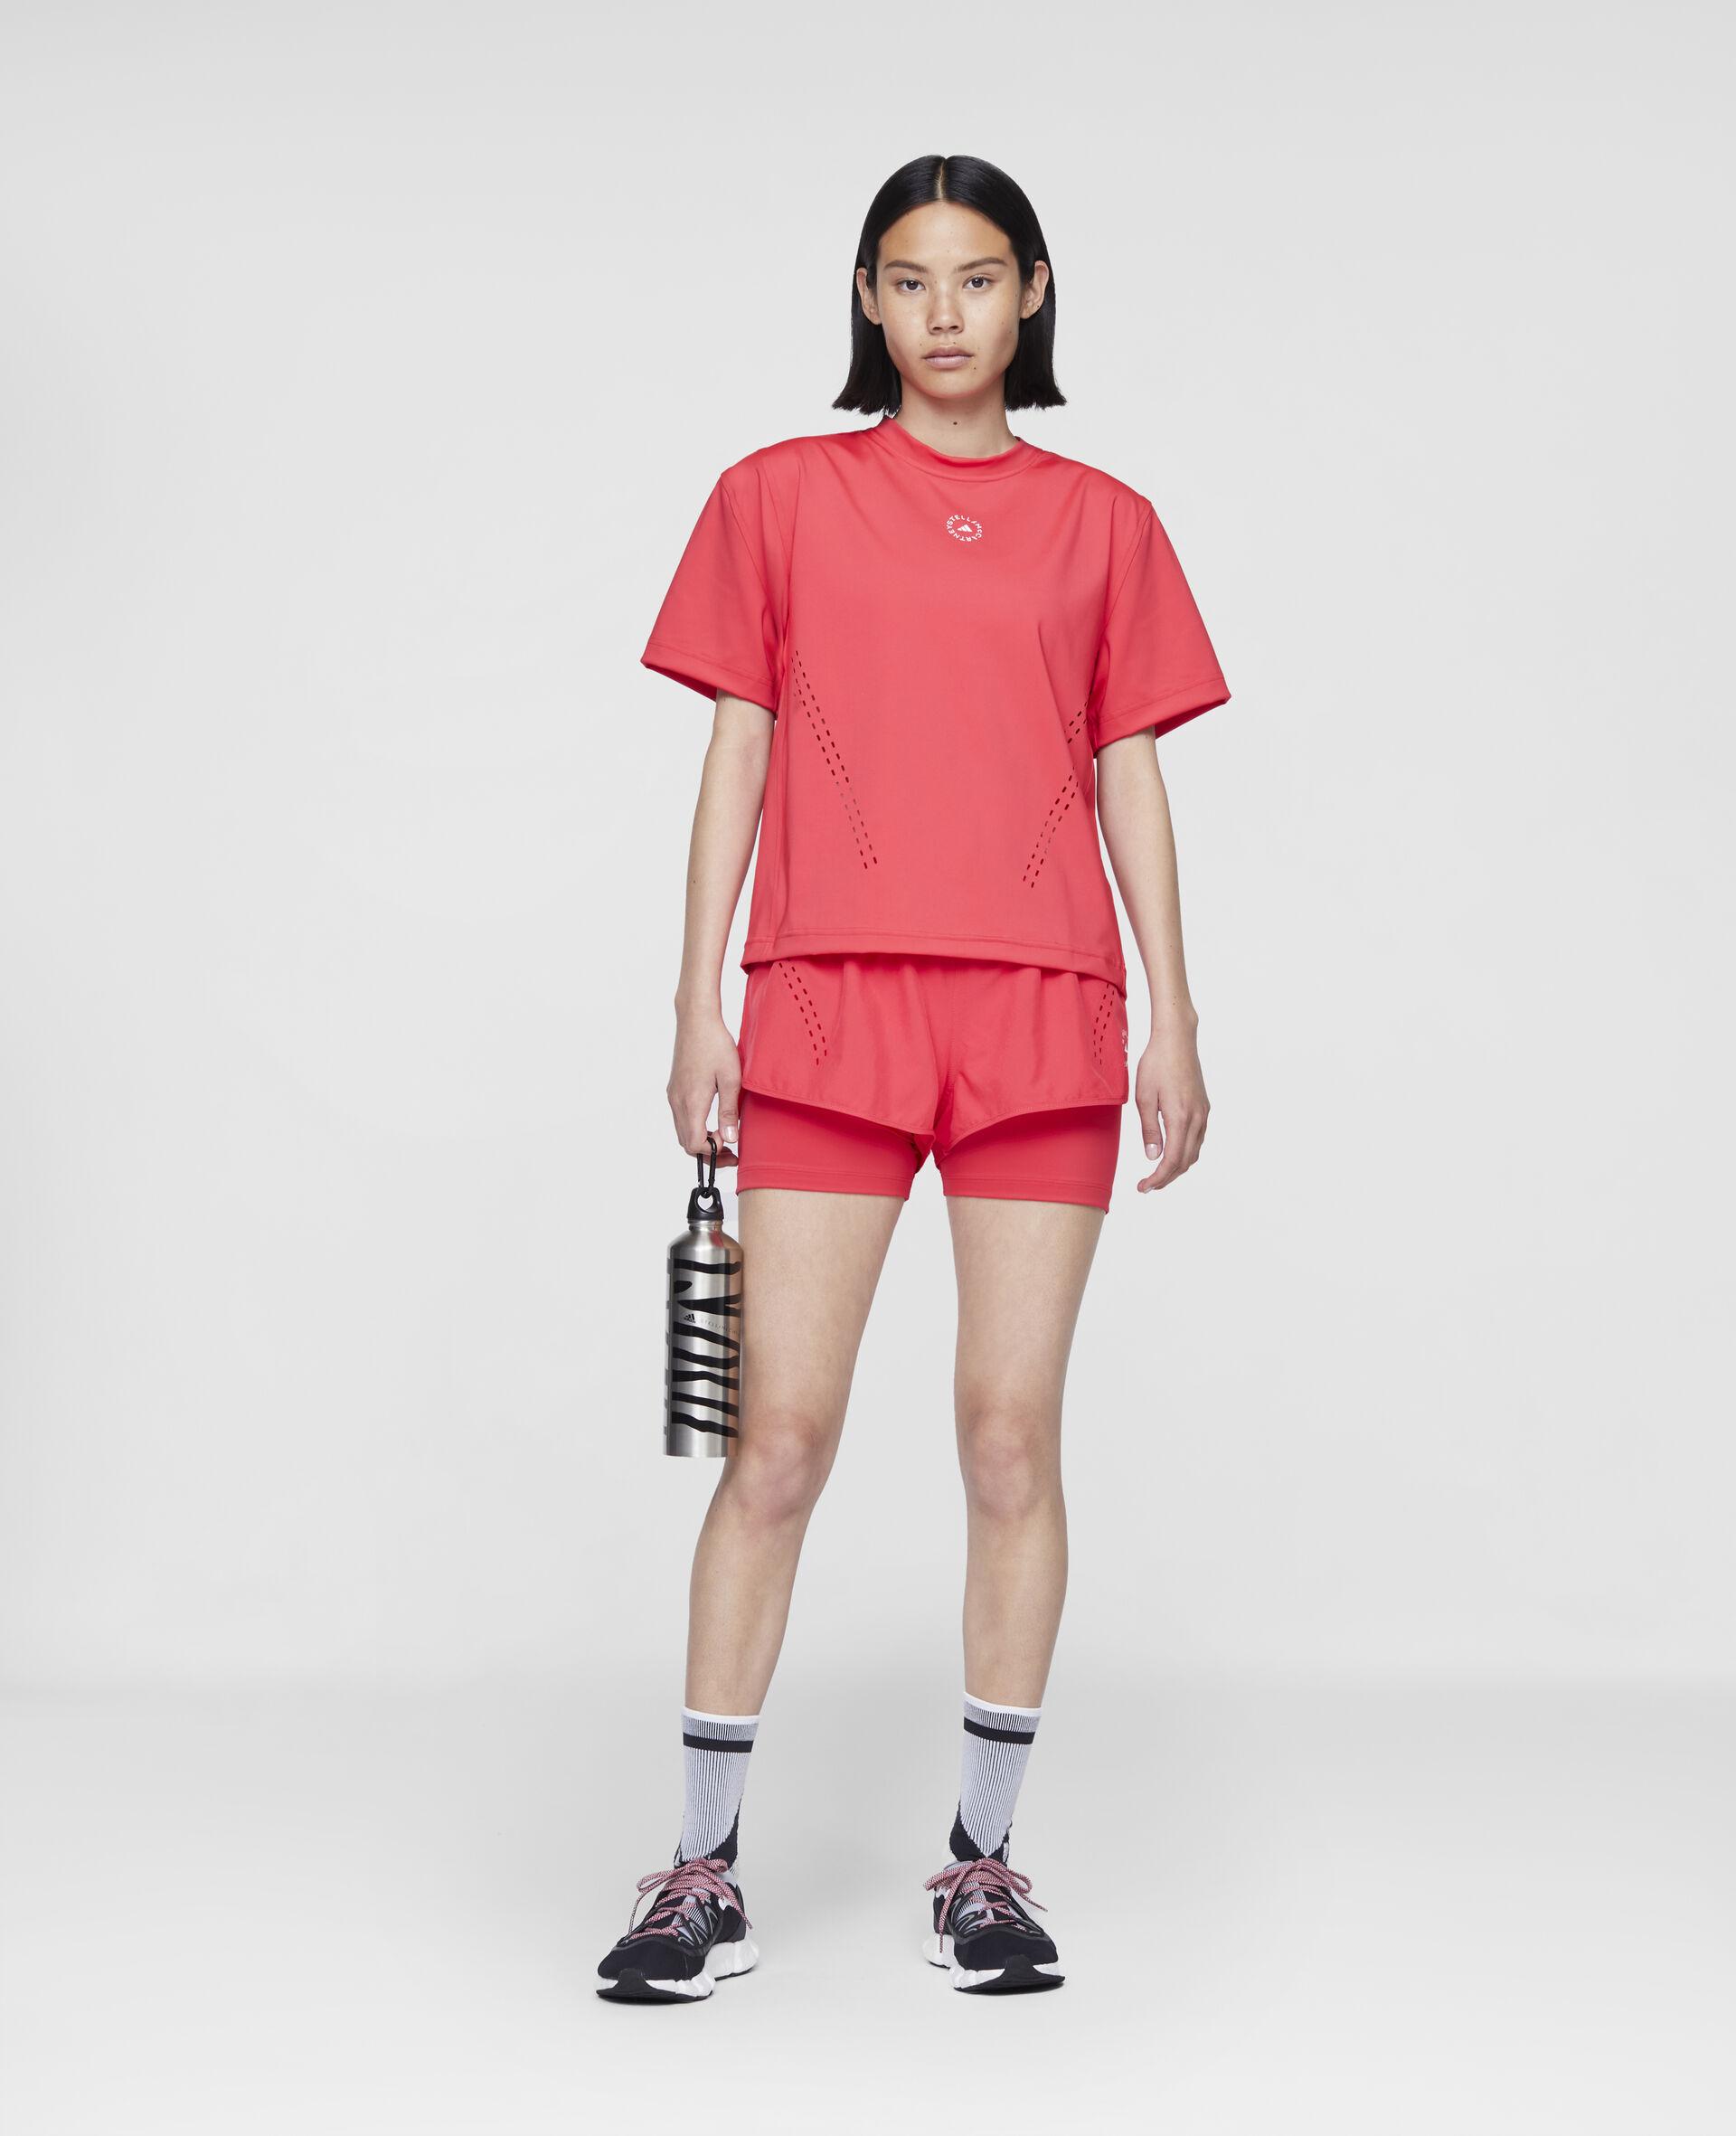 Rosa TruePurpose Trainings-Shorts-Rose-large image number 1